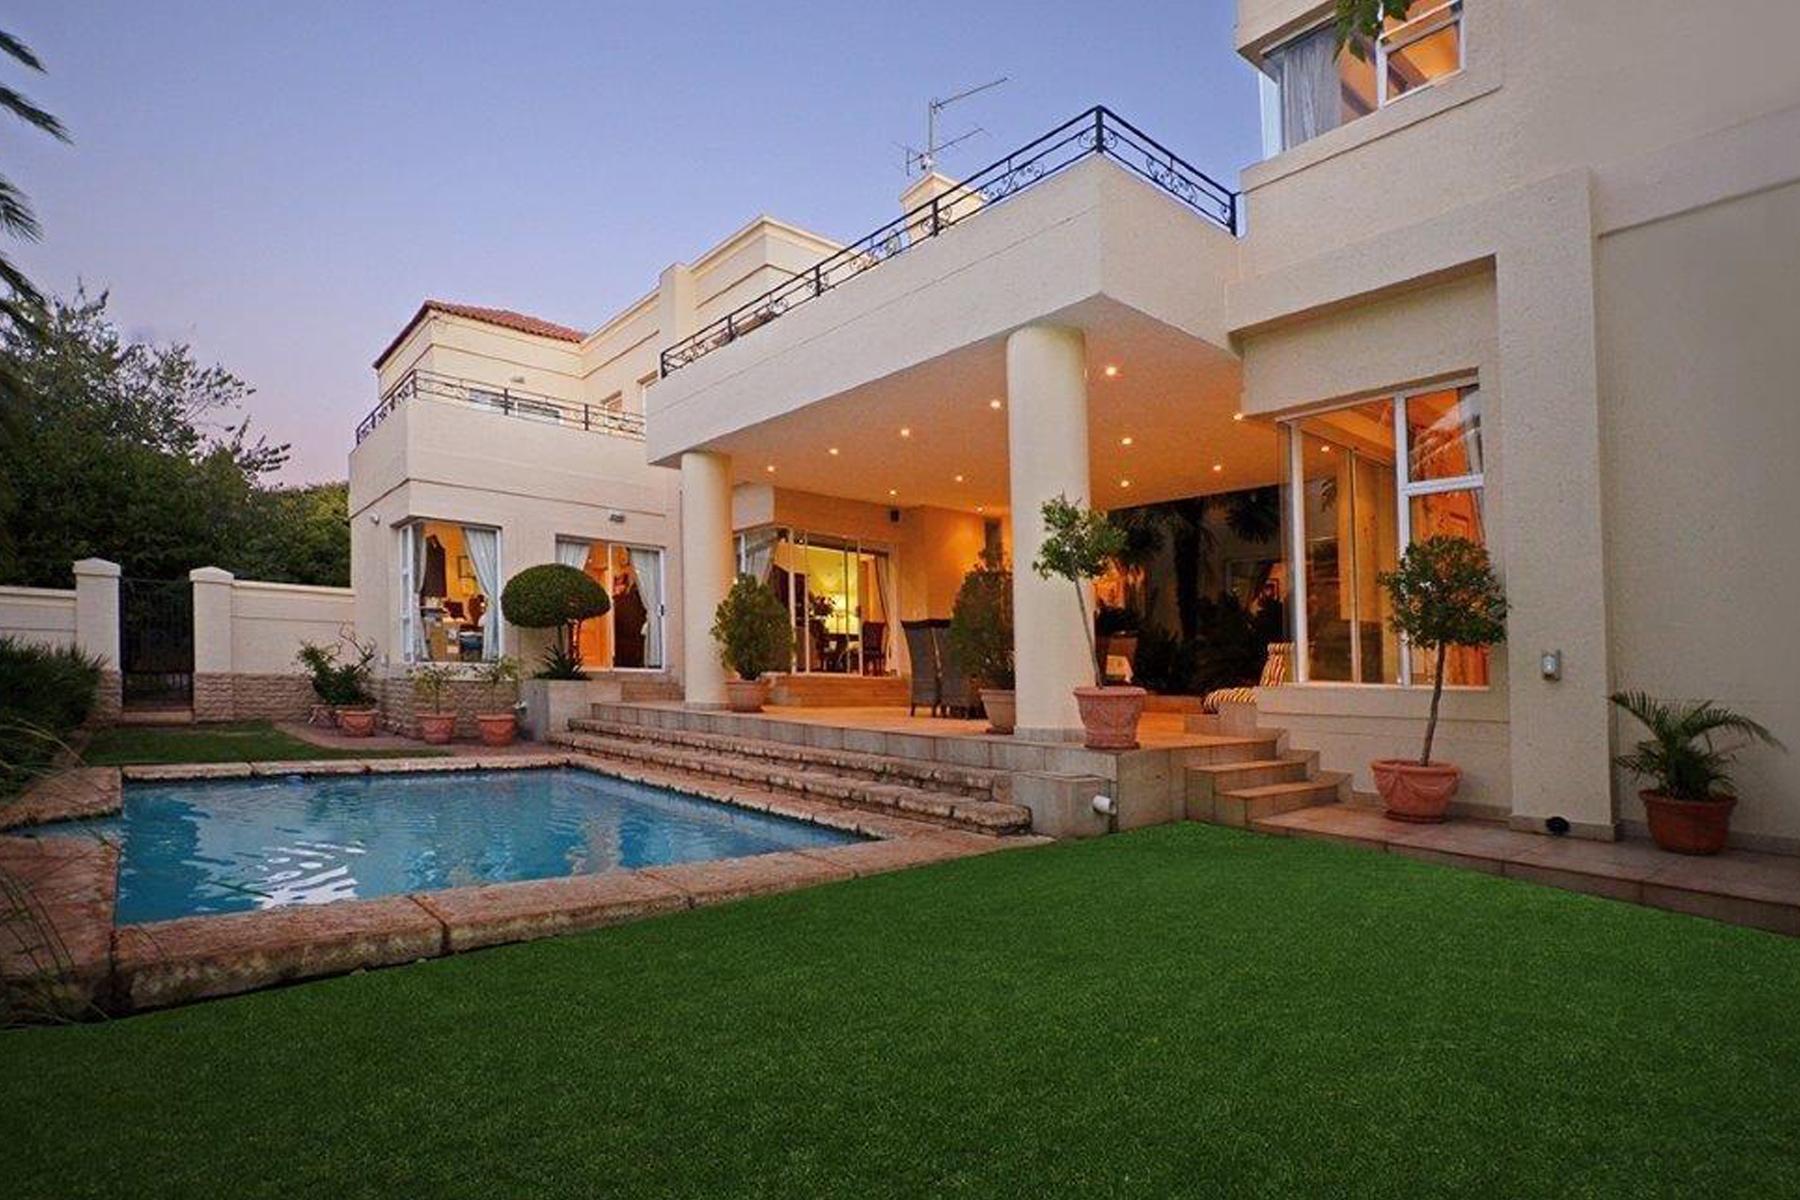 Single Family Home for Sale at Killara Place Johannesburg, Gauteng, 2007 South Africa